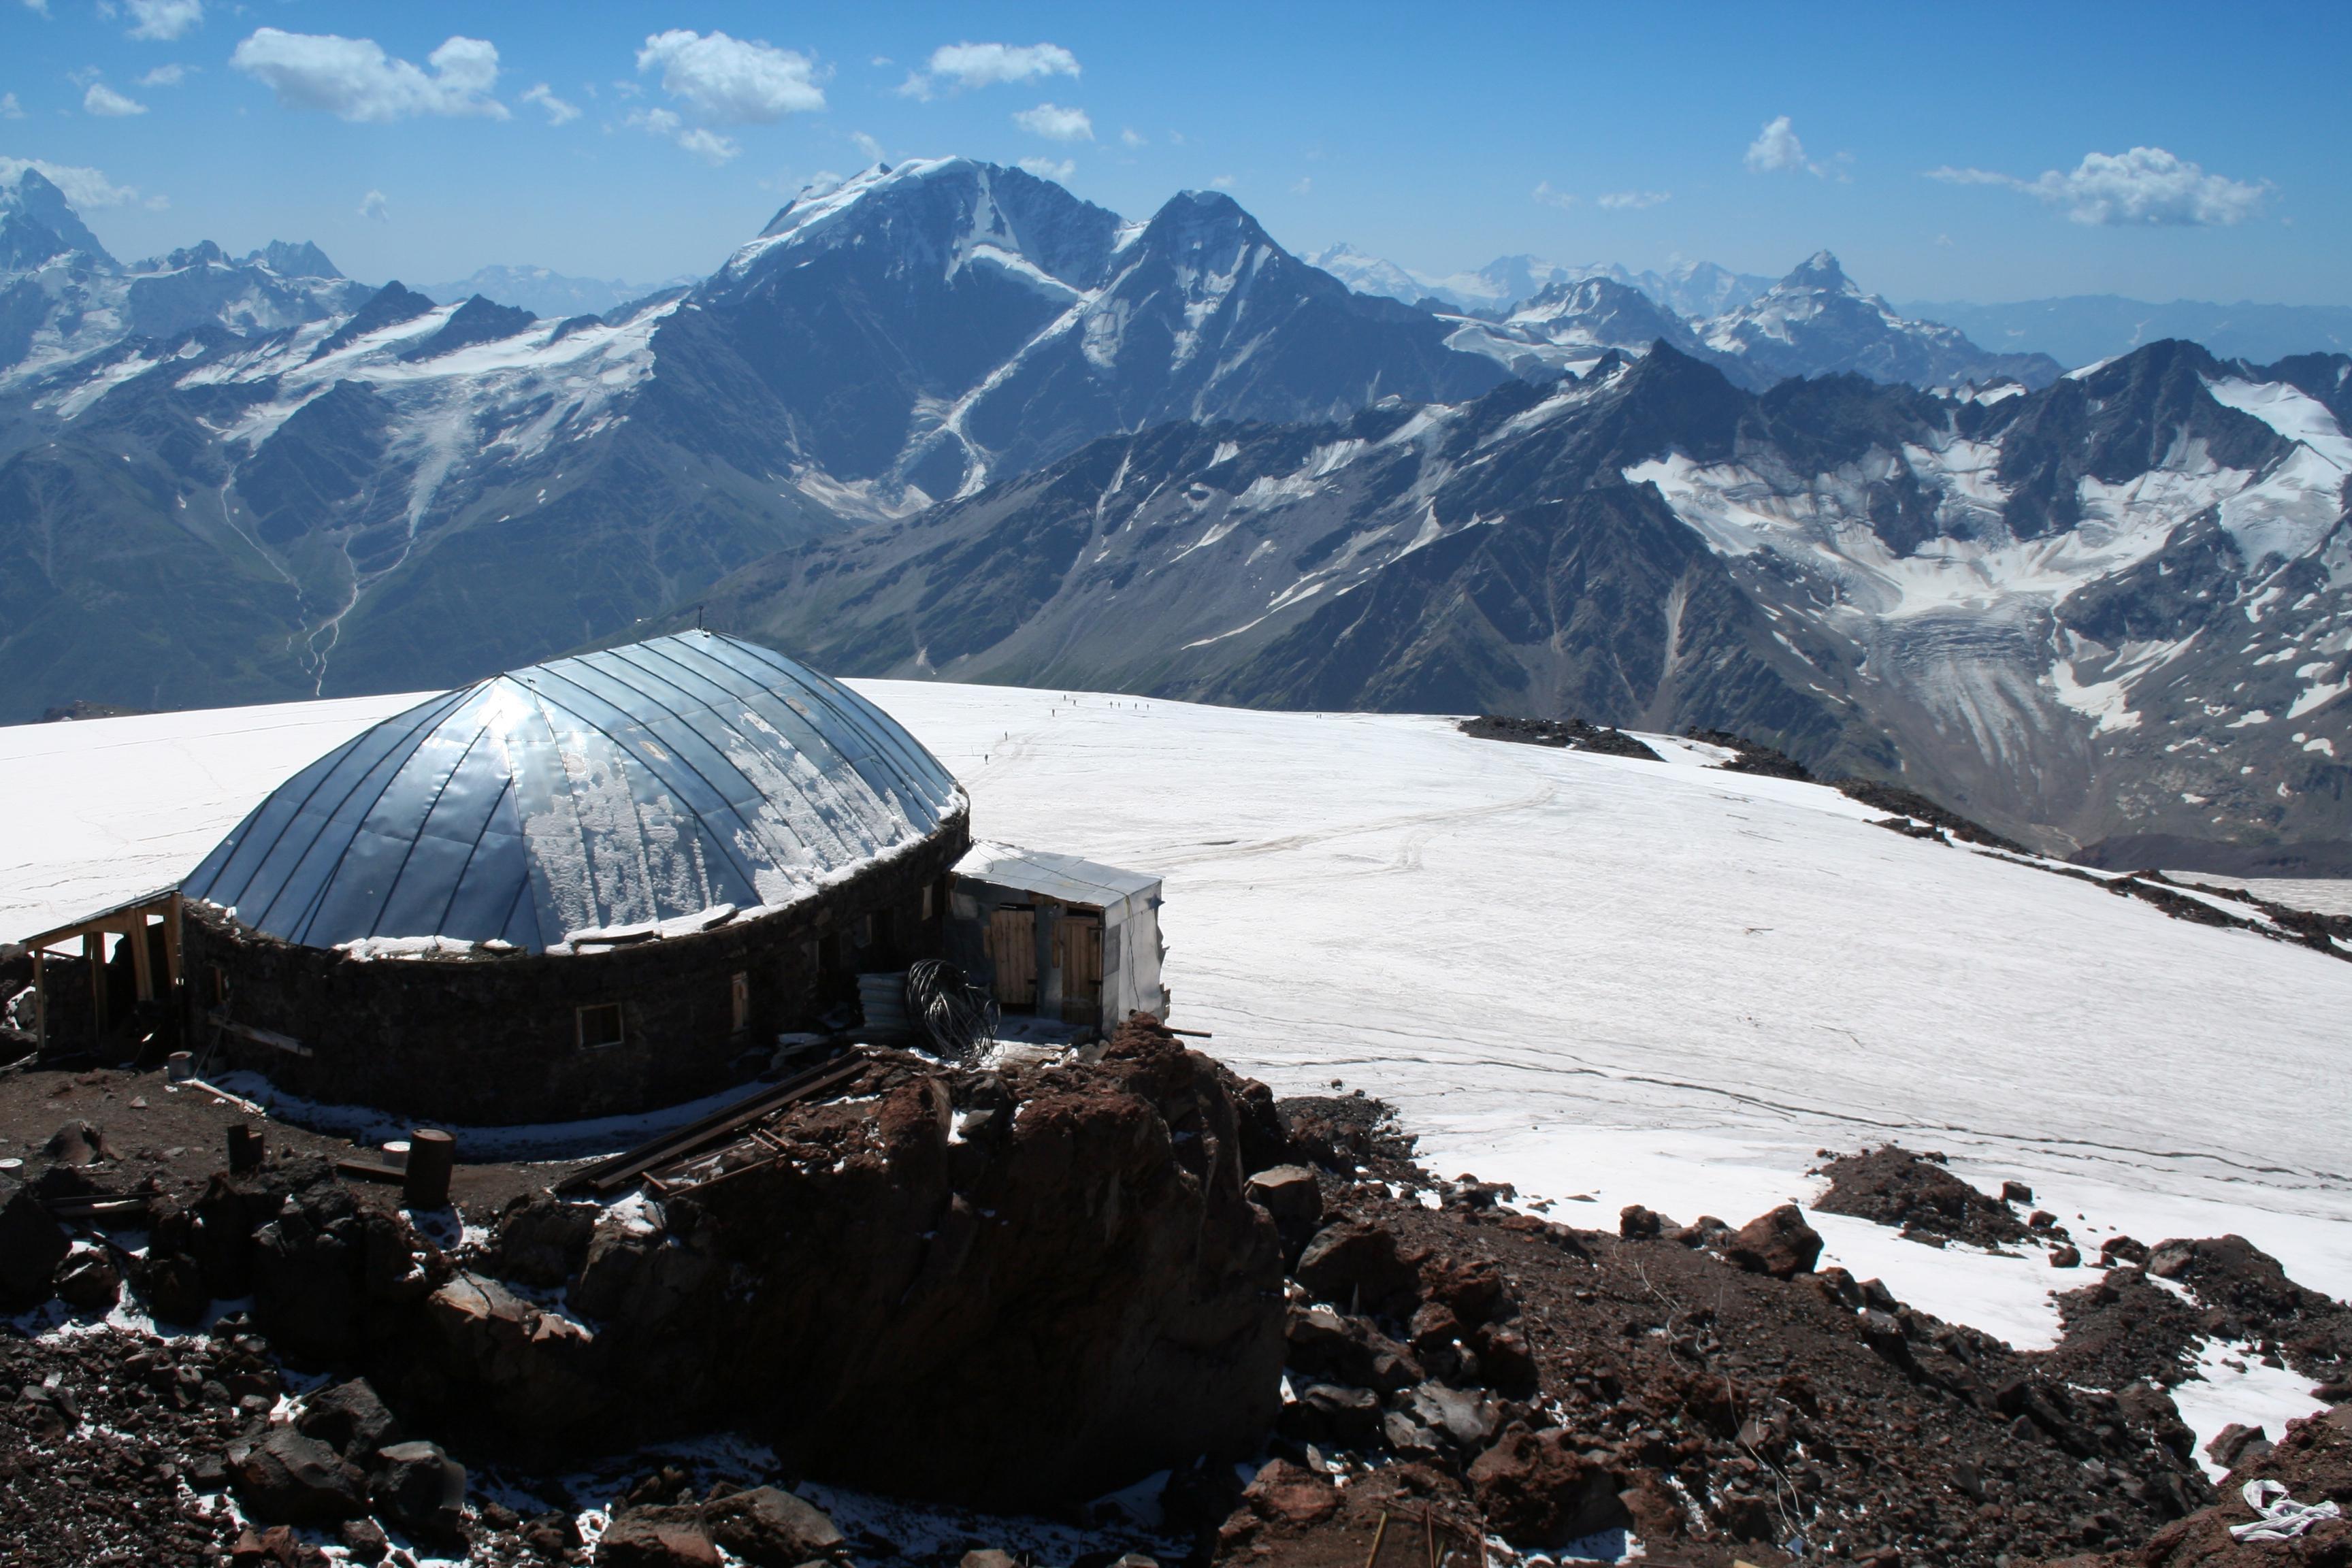 Mount Elbrus Full Hd